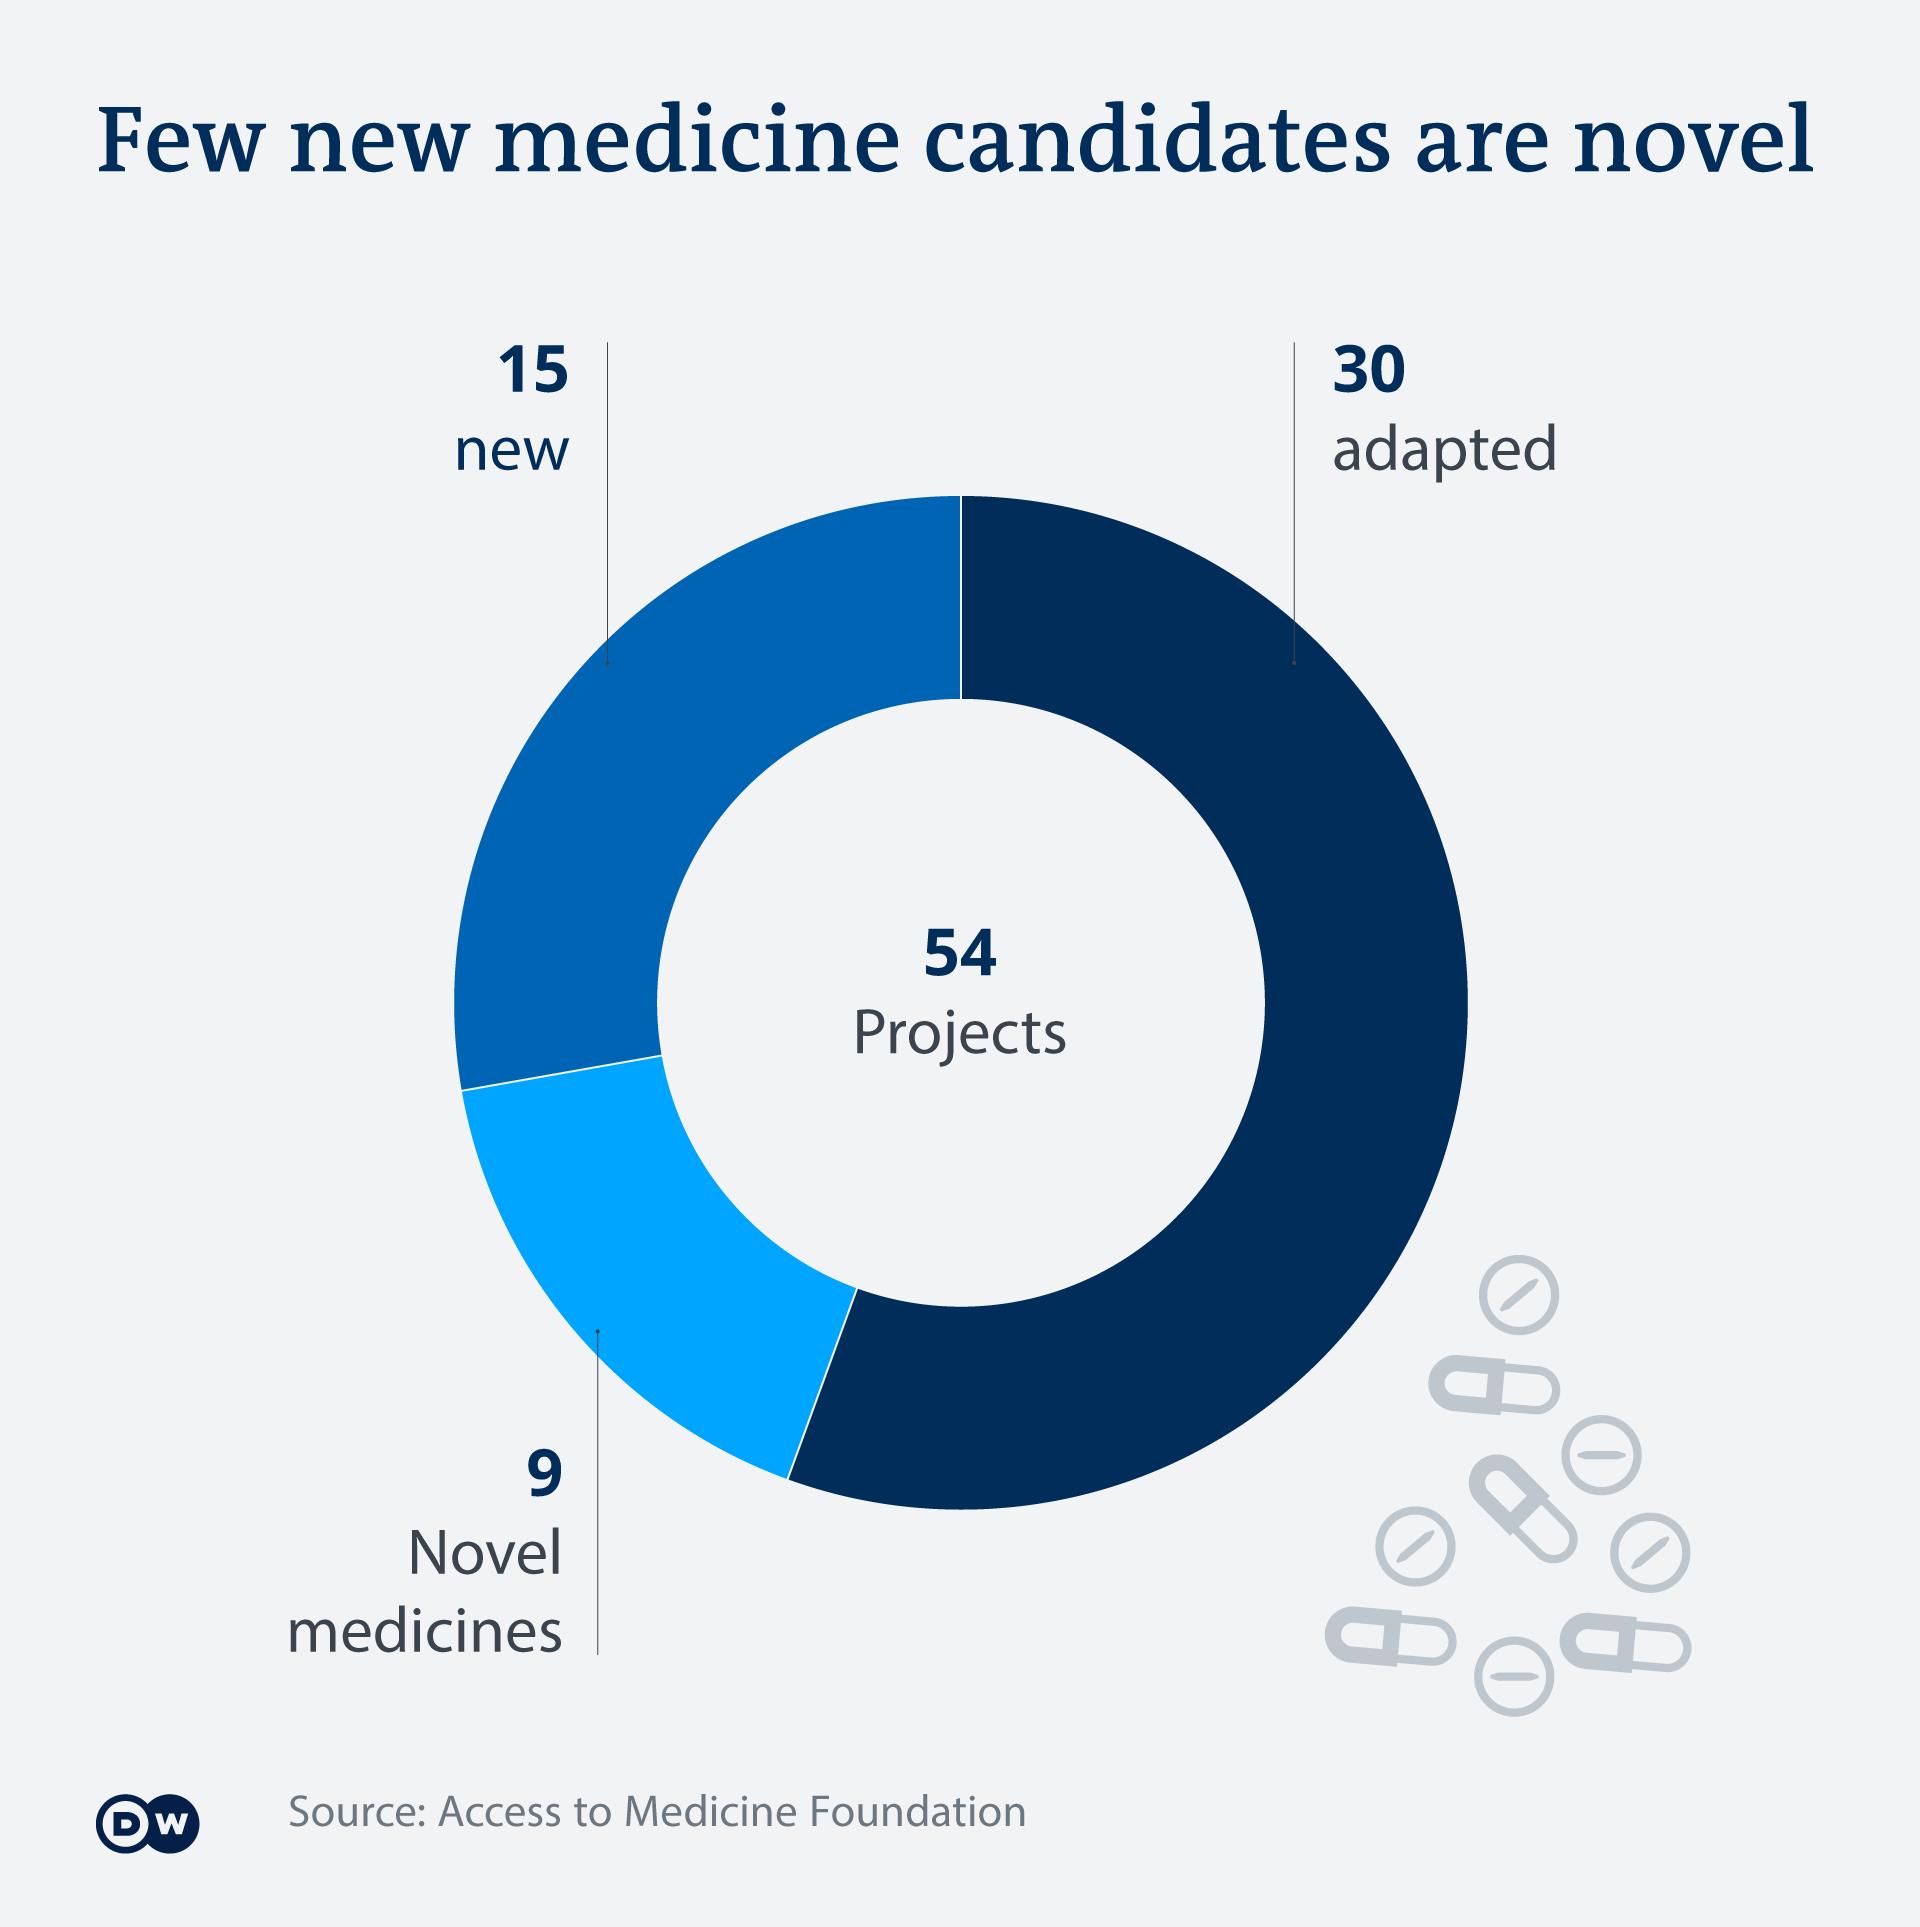 Few new medicine candidates are novel